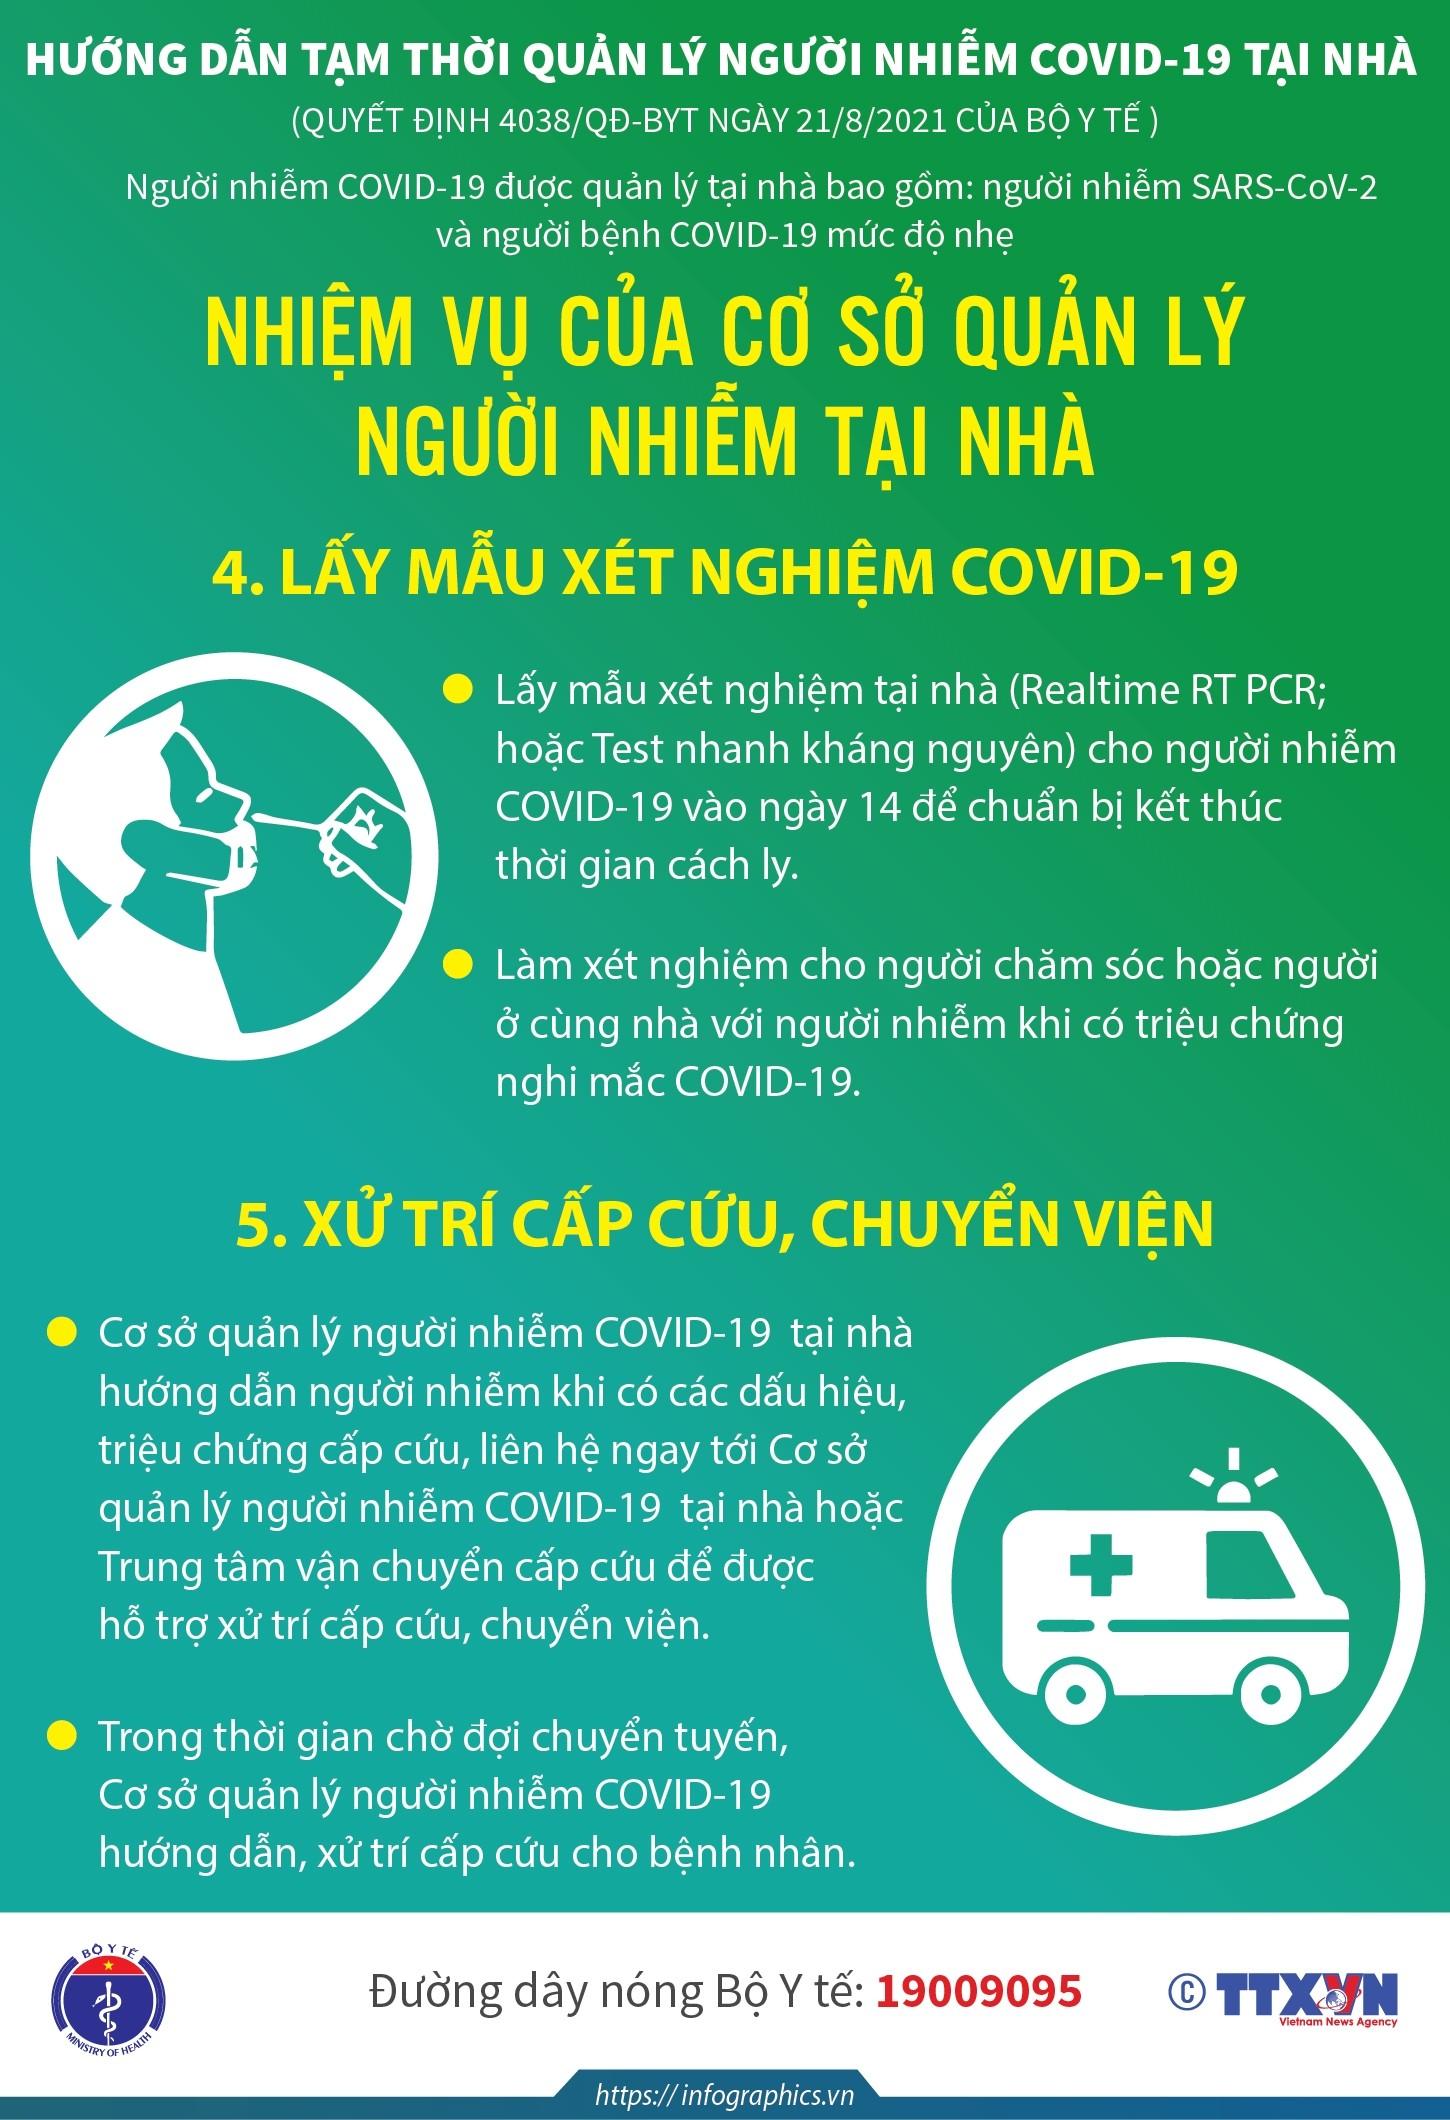 3206-2021-8-23-vn-hd-quan-ly-nguoi-nhiem-covid-tai-nha-ngoc-05-1630377702.jpg